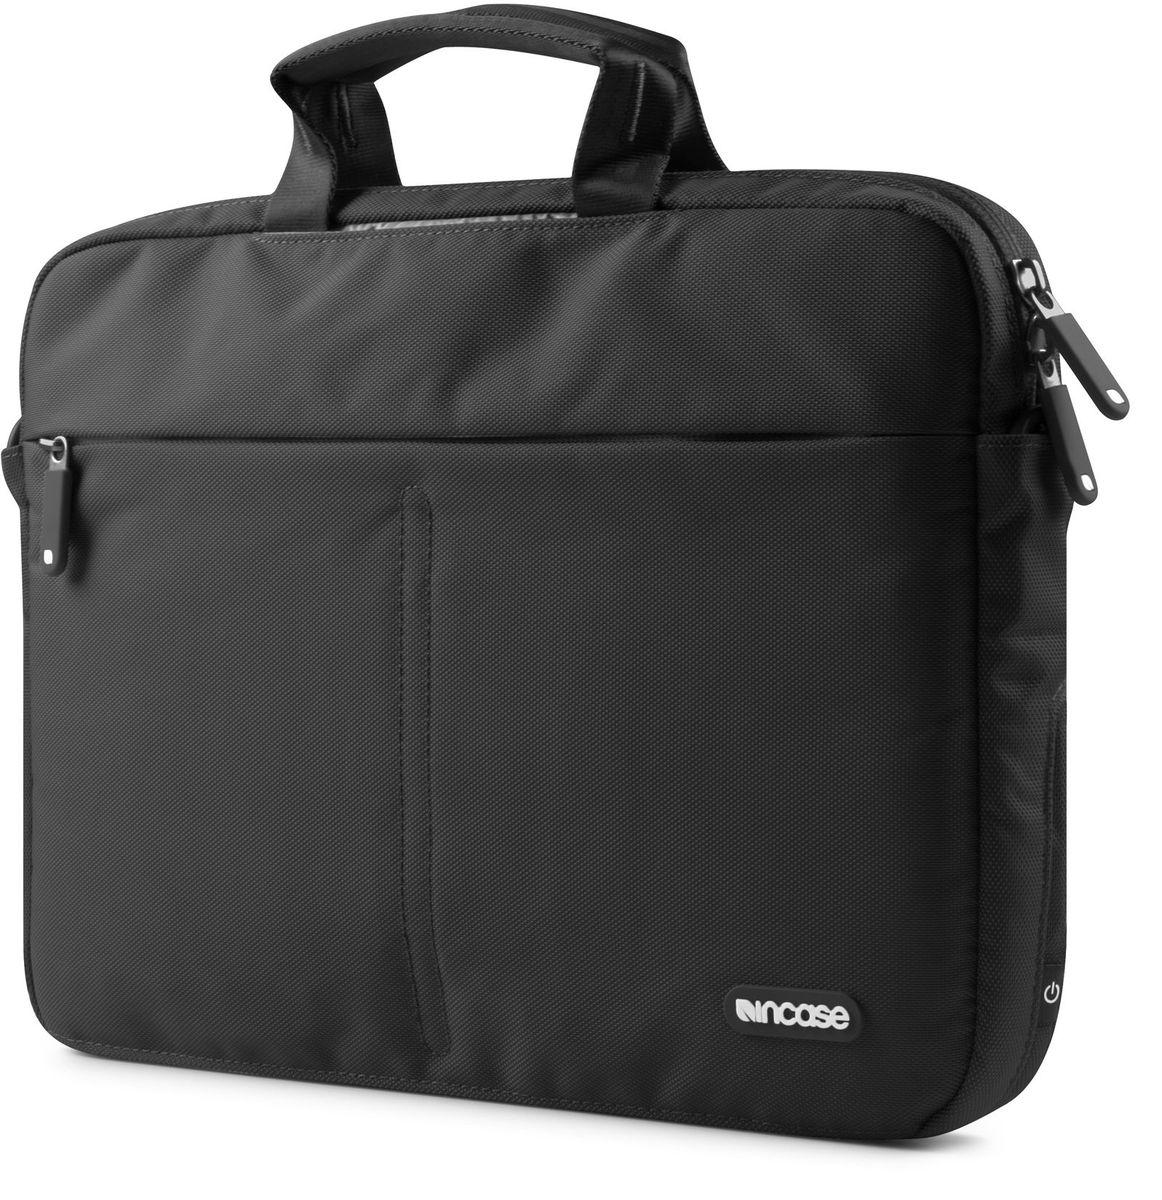 цена на Incase Nylon Pro Sling Sleeve, Black сумка для ноутбука Apple MacBook Pro 13